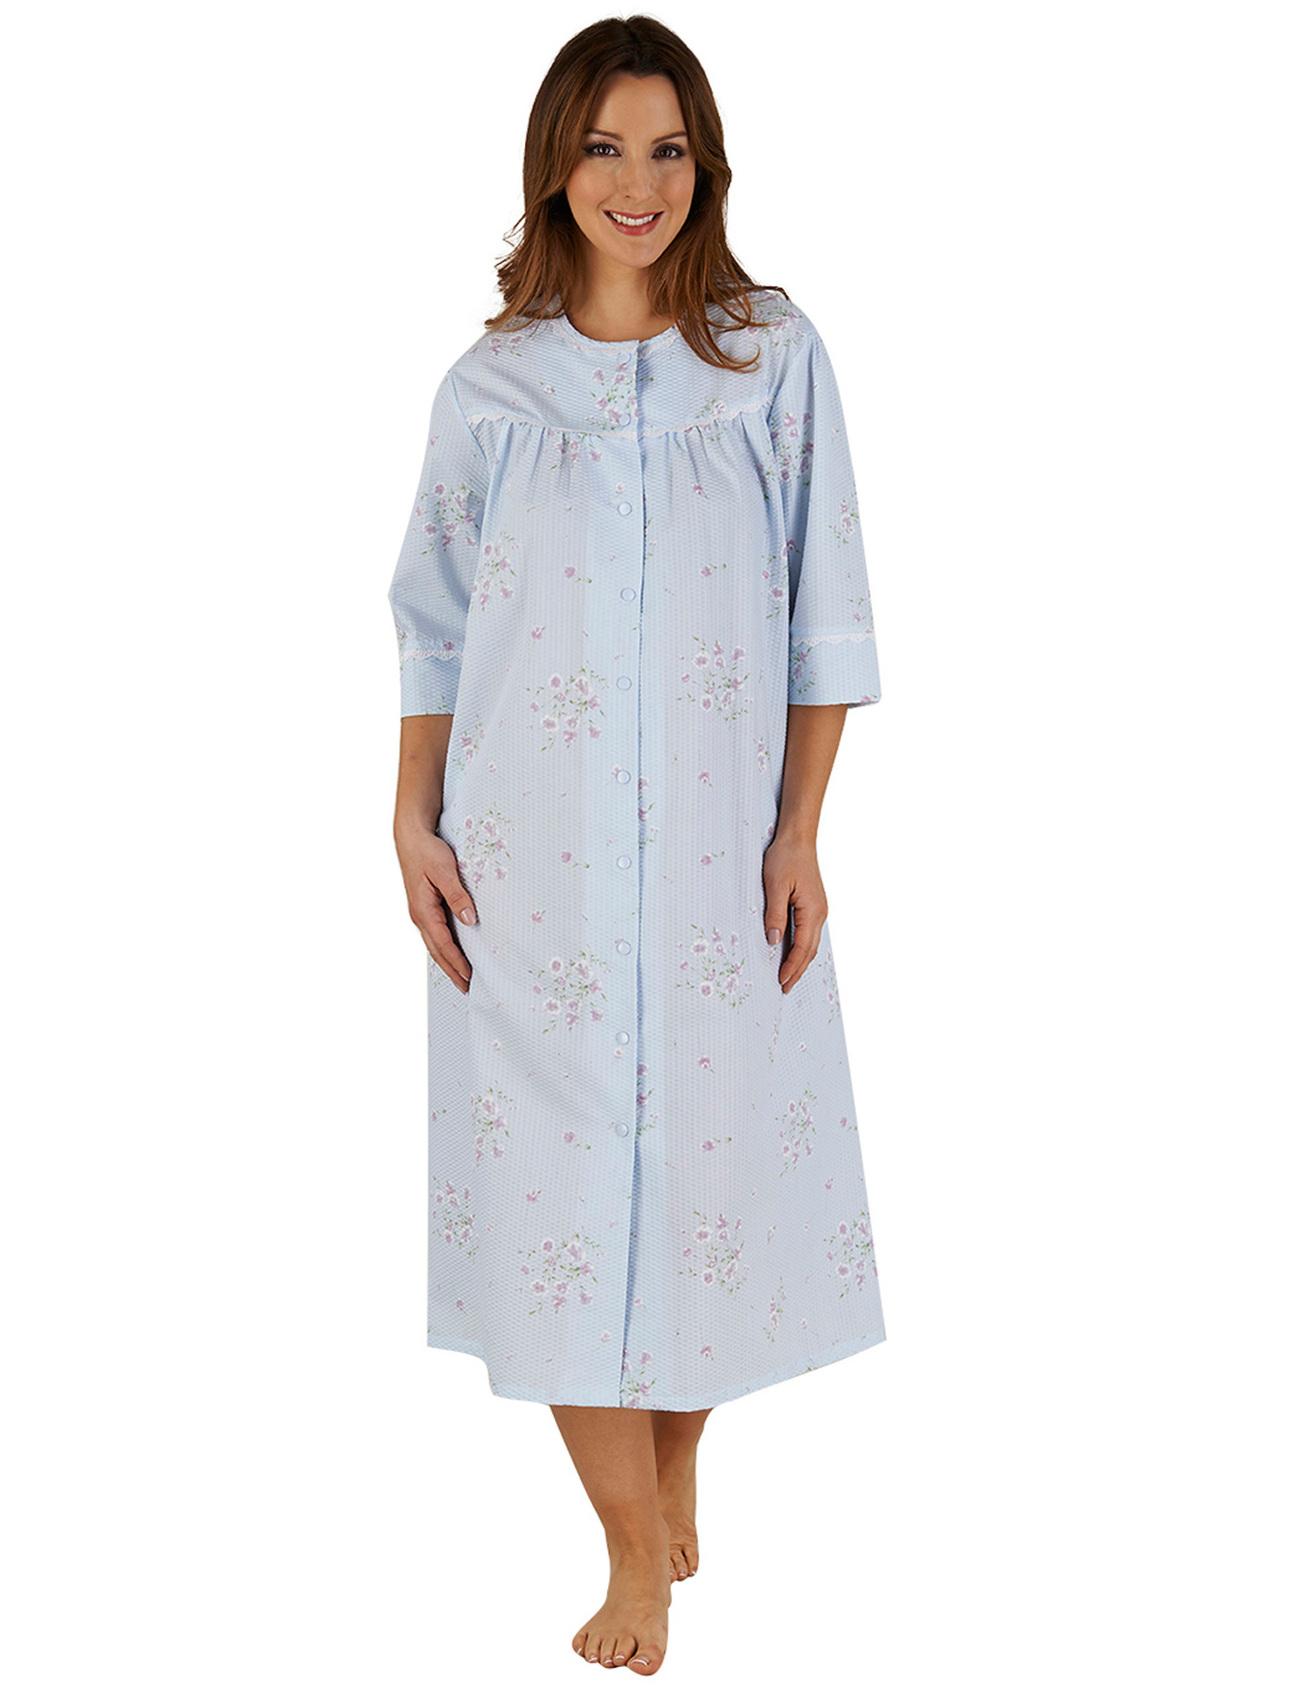 Womens Bathrobe Button Poppers Floral Seersucker Ladies 3/4 Sleeve ...